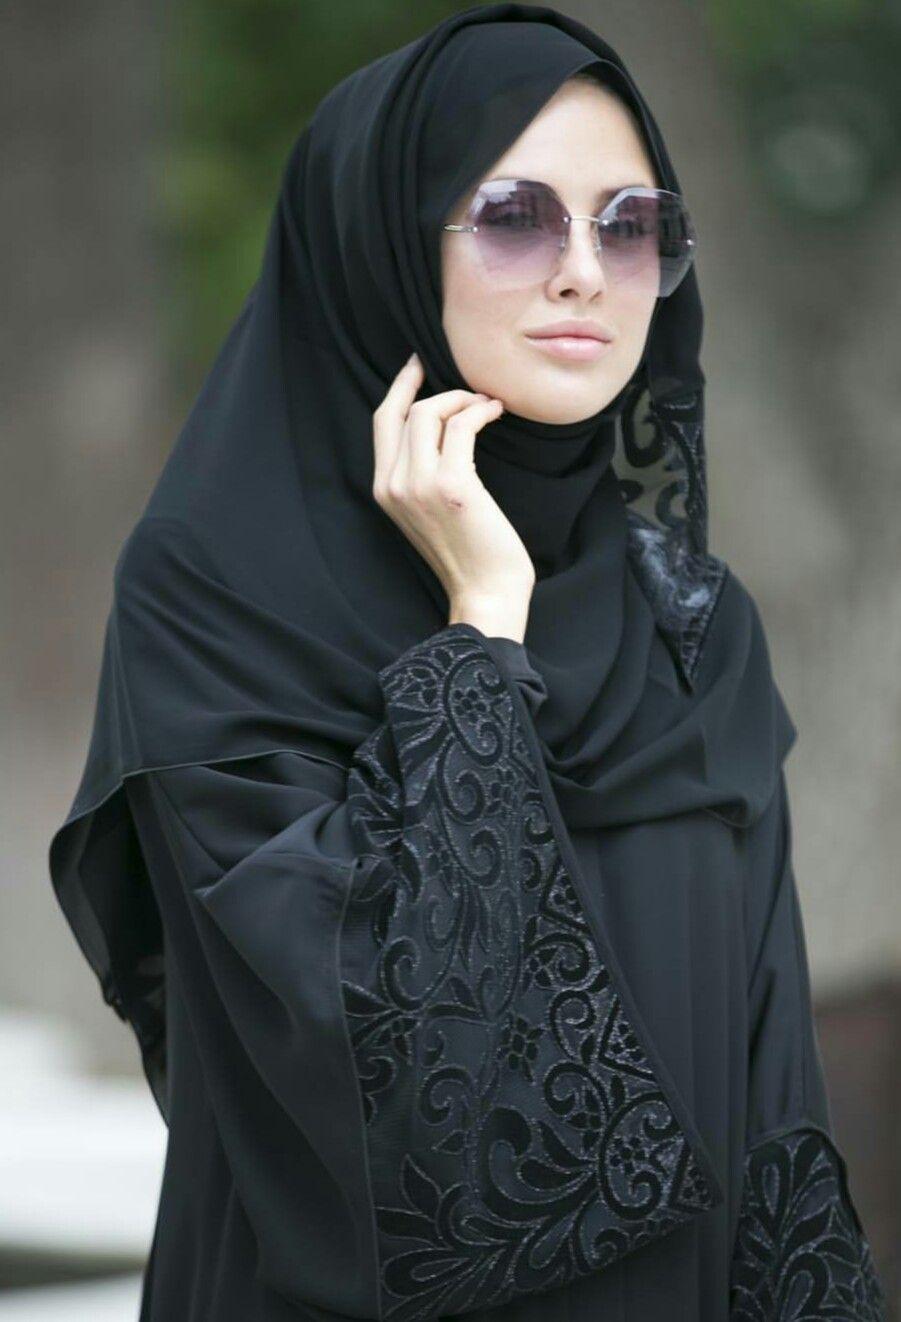 Pin By Labonno Rana On Conservative Clothing Abayas Fashion Muslimah Fashion Outfits Abaya Fashion